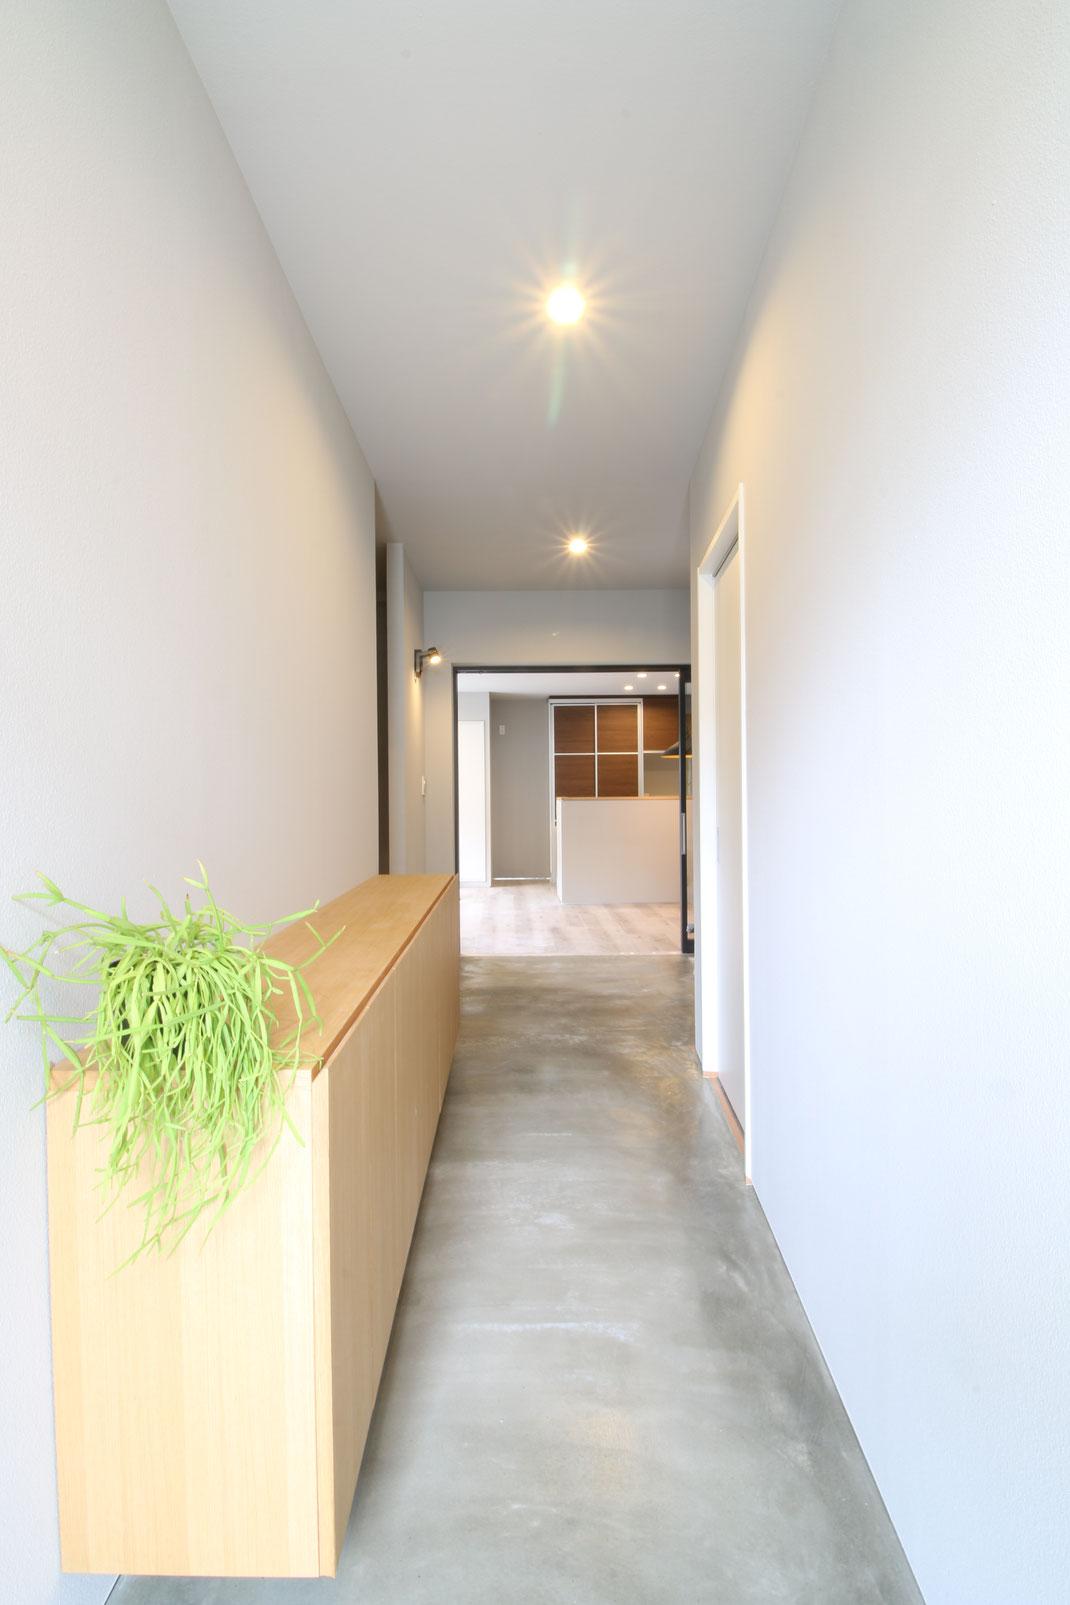 K邸リノベーション モルタルの土間玄関 空間デザイン